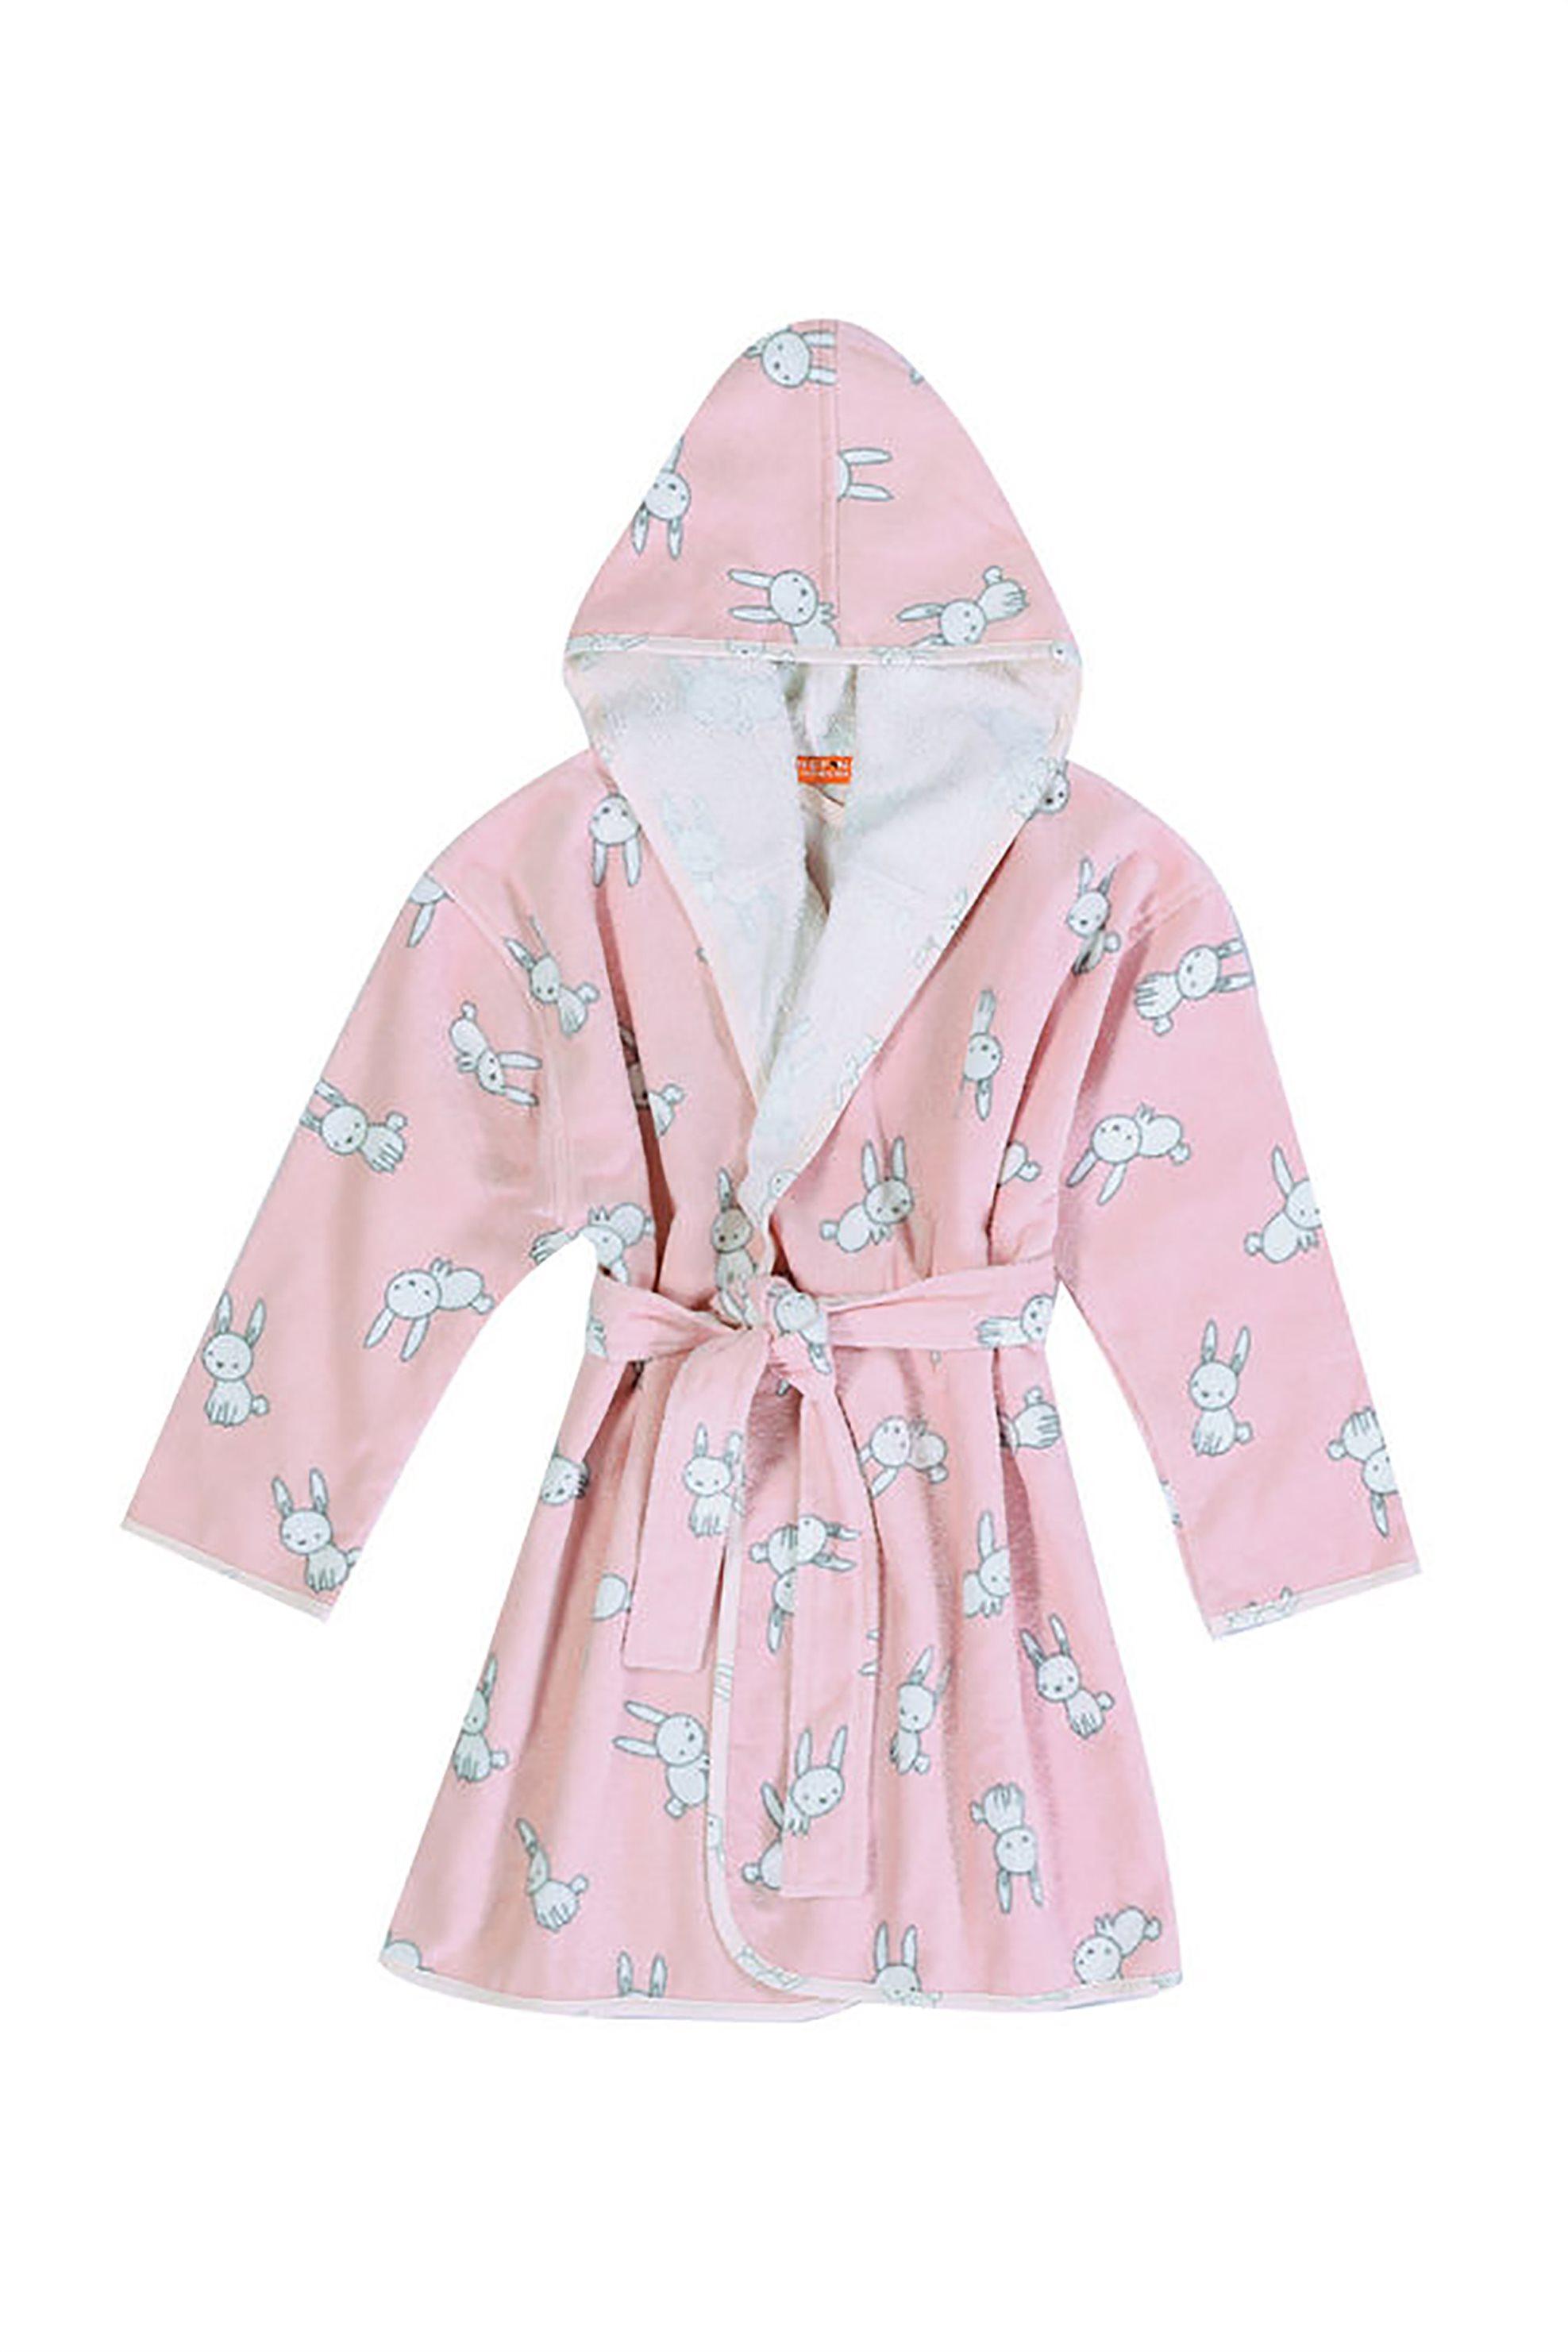 NEF-NEF Βρεφικό μπουρνούζι Bunny Life - 022857 - Ροζ home   παιδια   παιδικά μπουρνούζια   ρόμπες